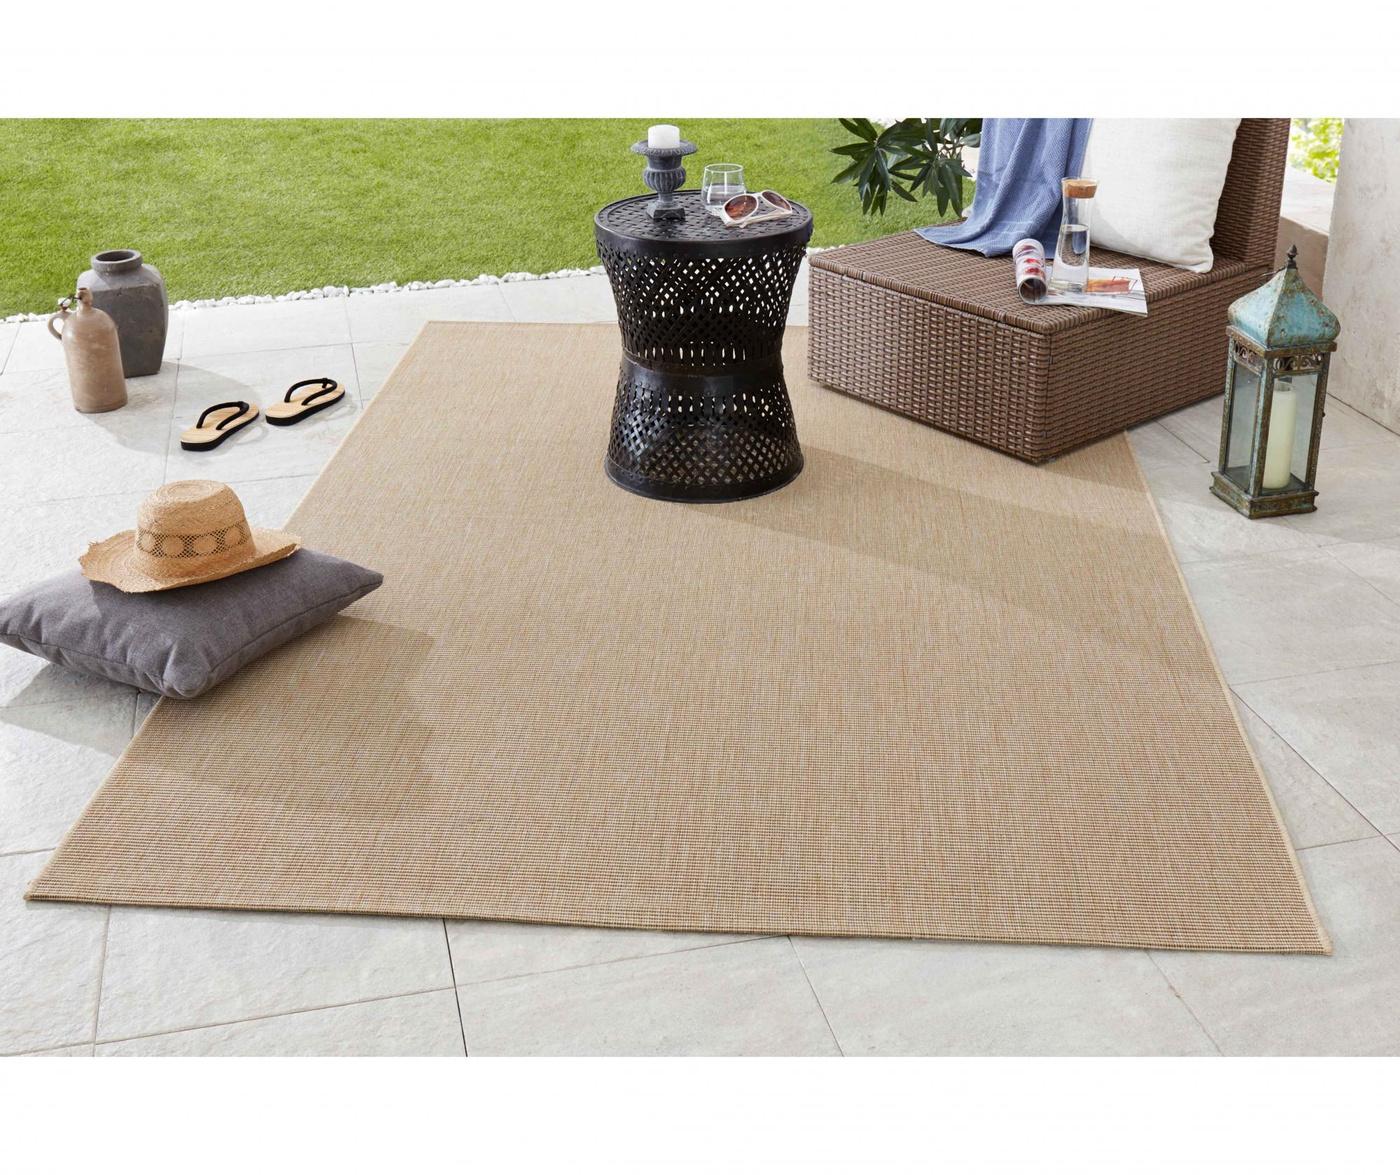 Tepih za vanjski prostor Meadow Match Beige 200x290 cm